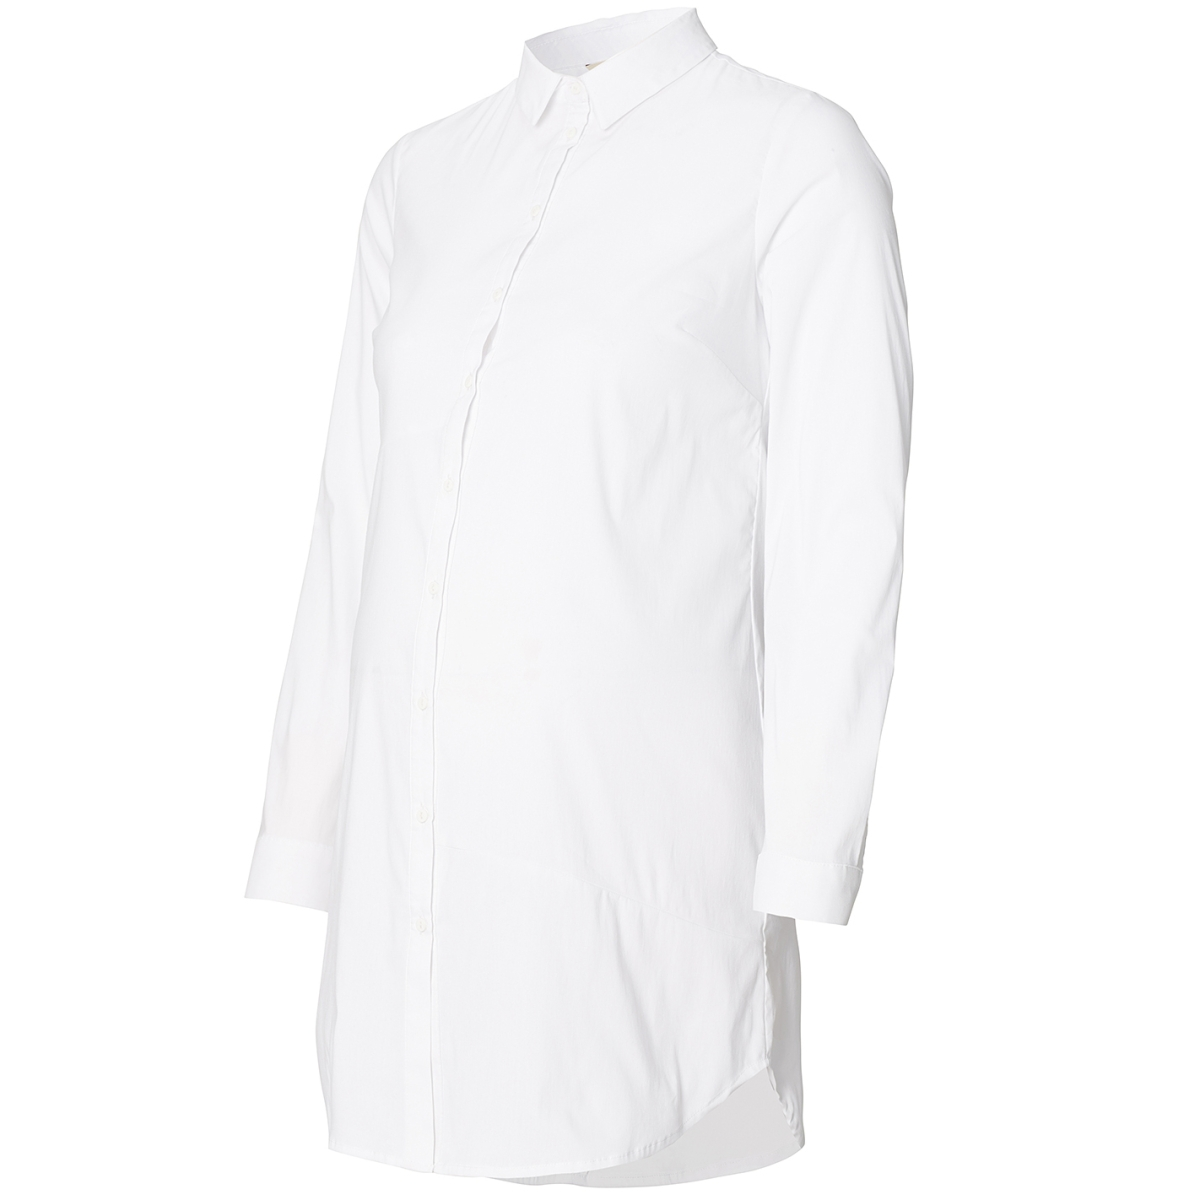 70633 blouse hinte noppies positie blouse white